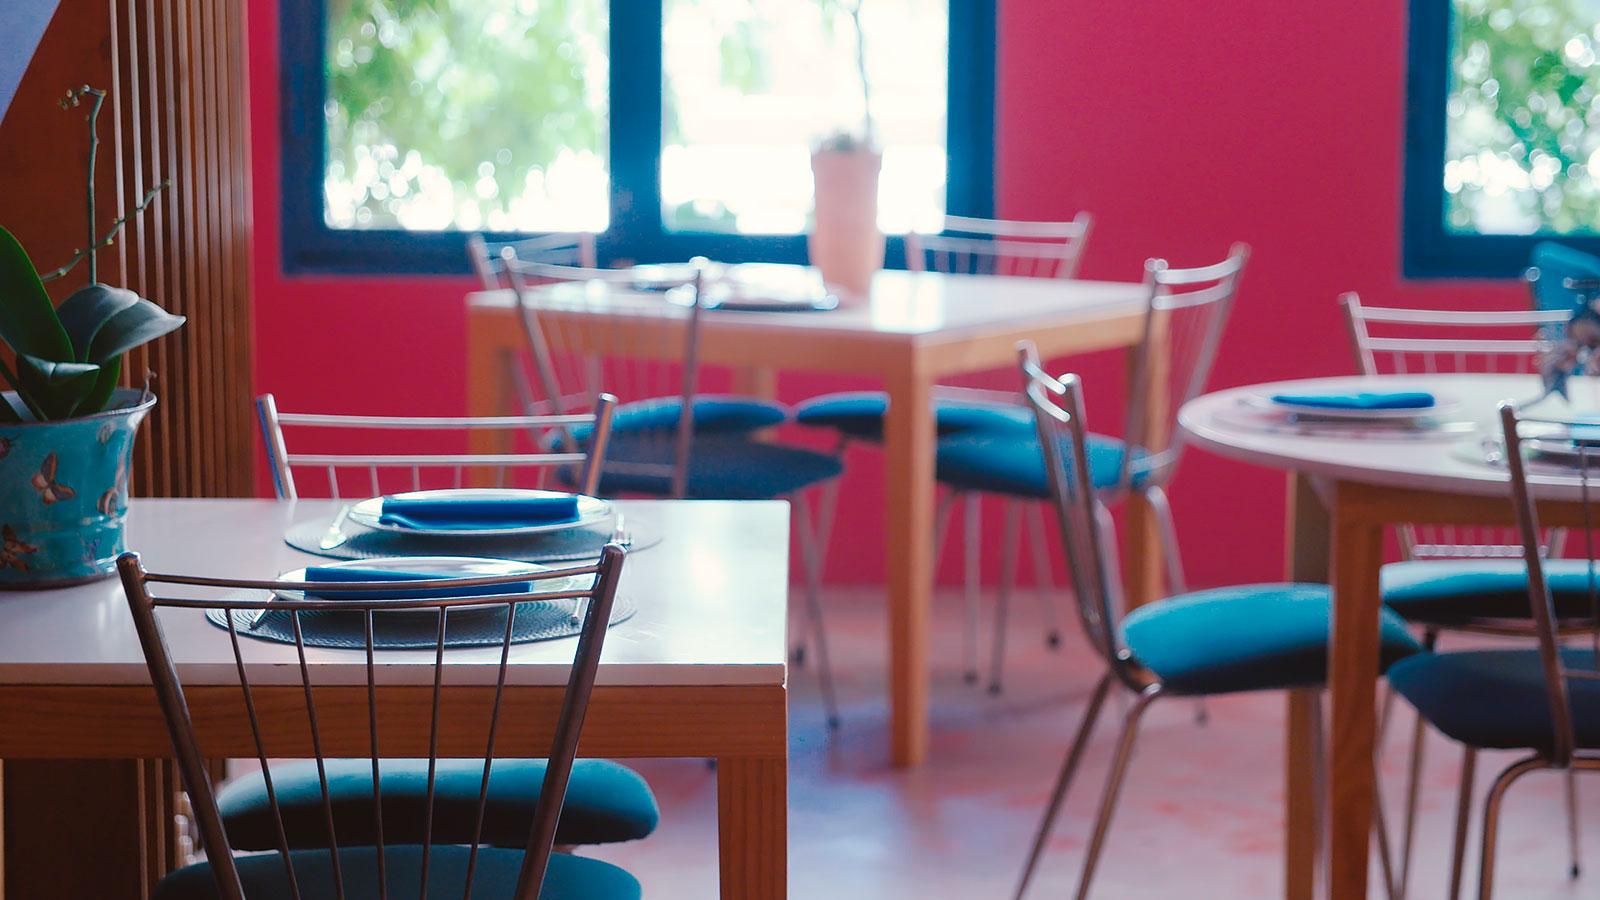 https://www.juanpablolucena.com/wp-content/uploads/2019/02/restaurante_amaltea_12-2.jpg